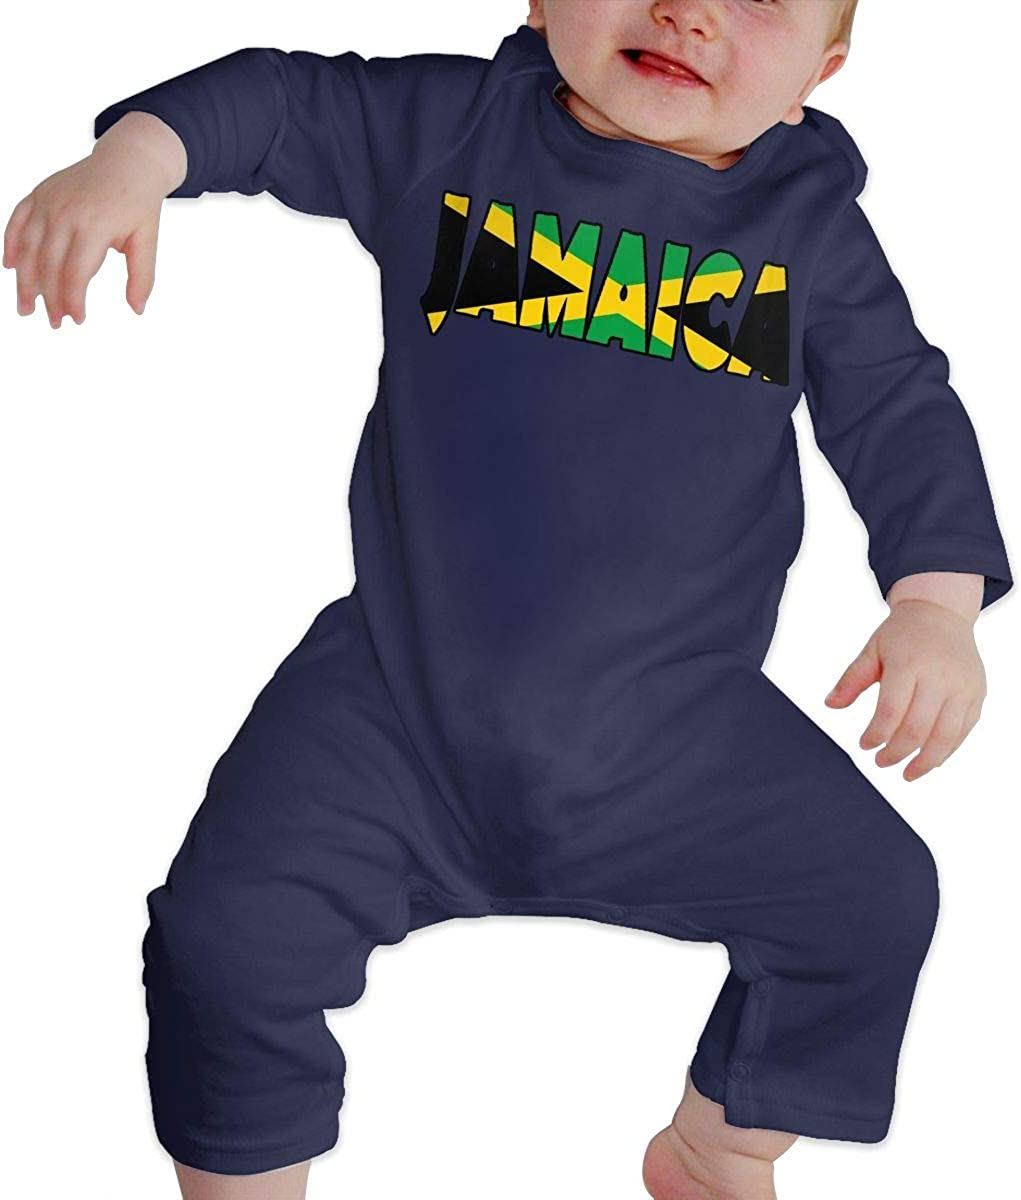 maichengxuan Bodysuit Jamaica Baby Climbing Clothing Baby Long Sleeve Garment Unisex Design Looks Great On Newborn 6-24 Months